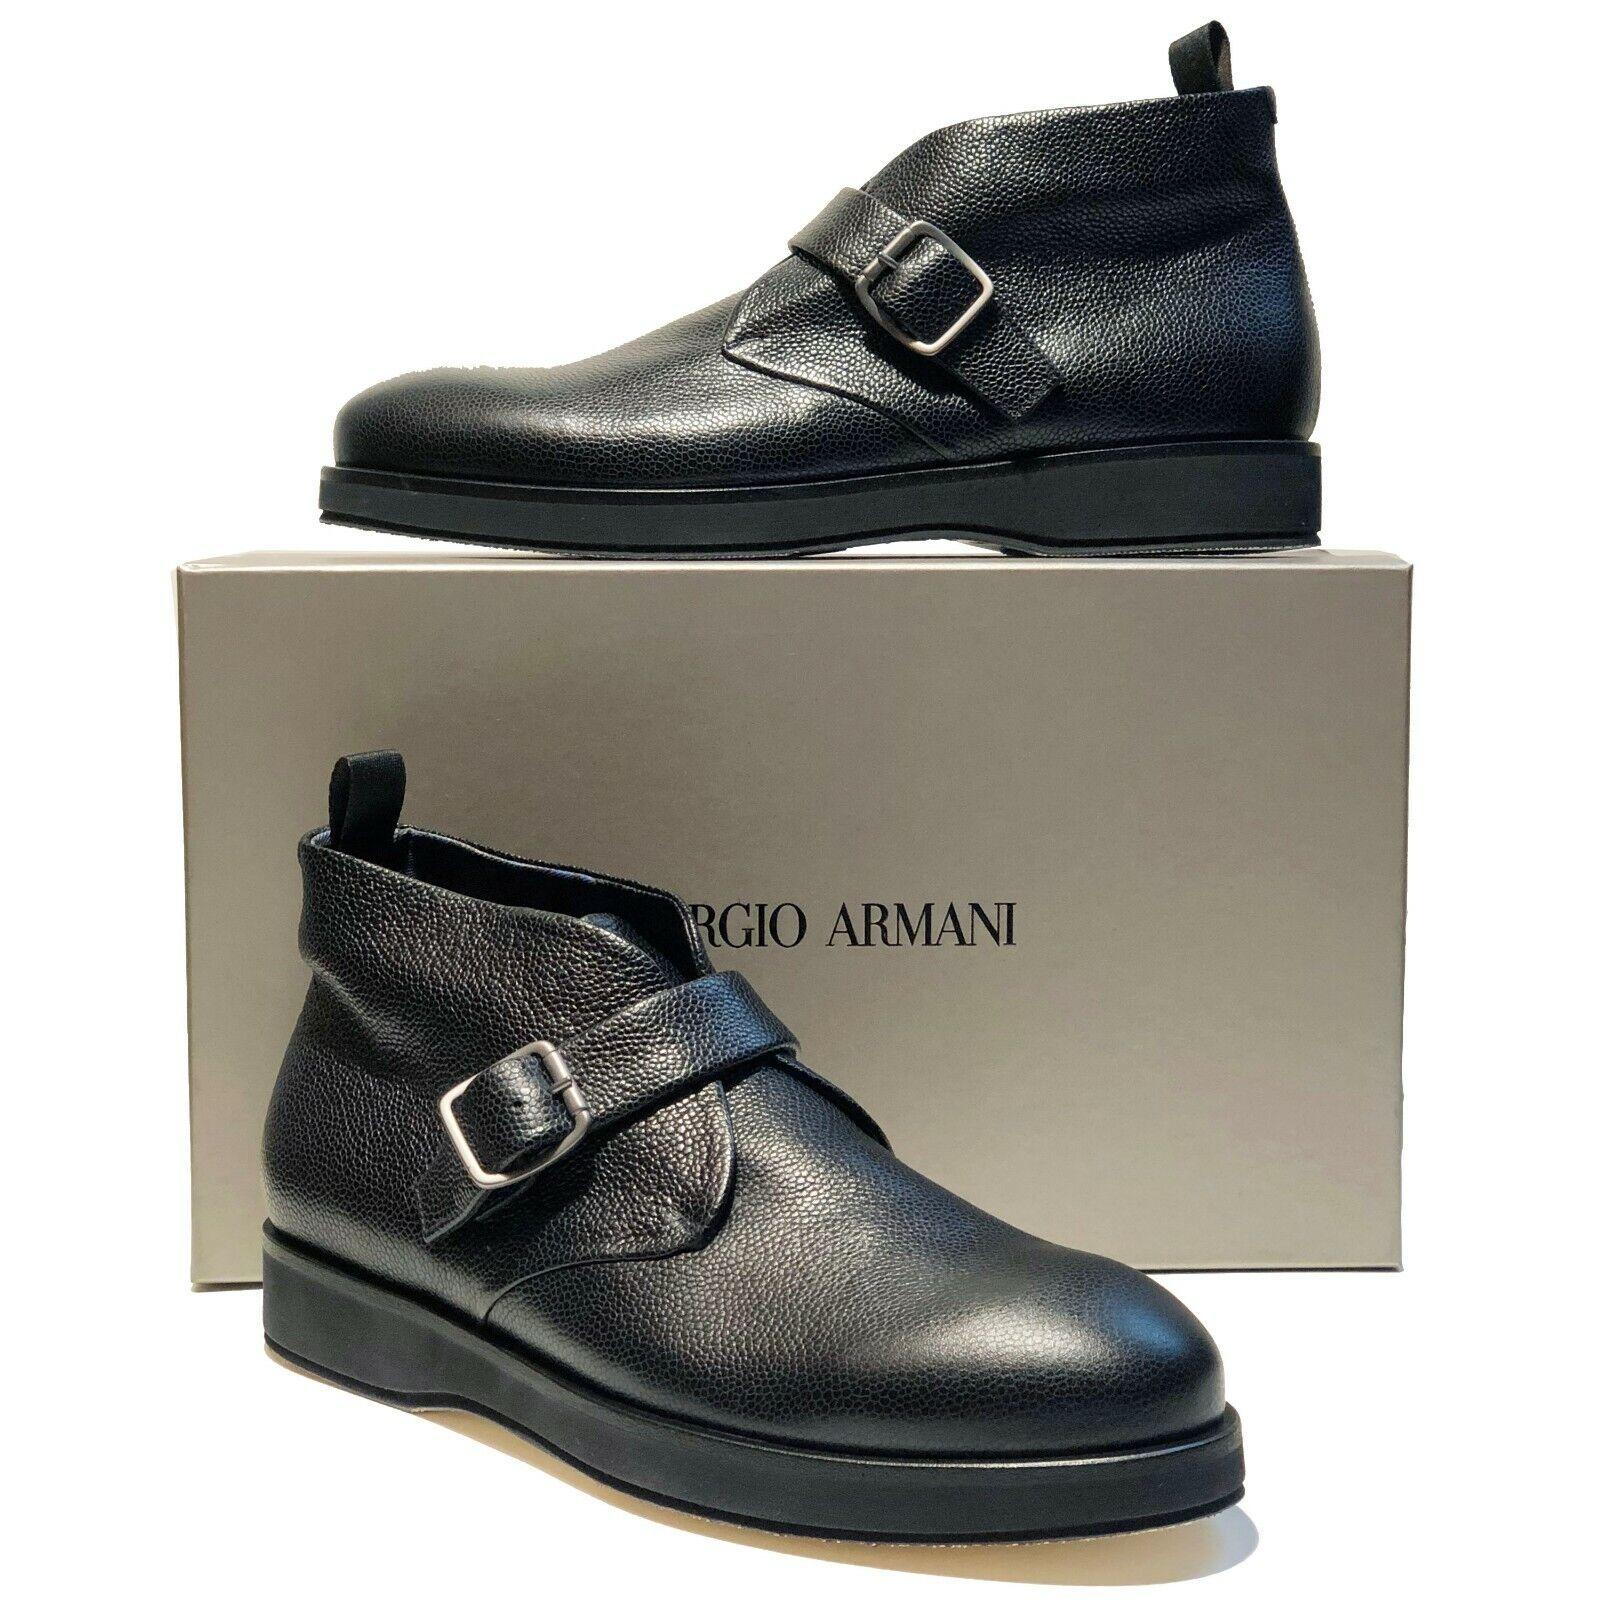 NEW Giorgio ARMANI Black Pebbled Leather Dress Men's Fashion Buckle Boots Casual